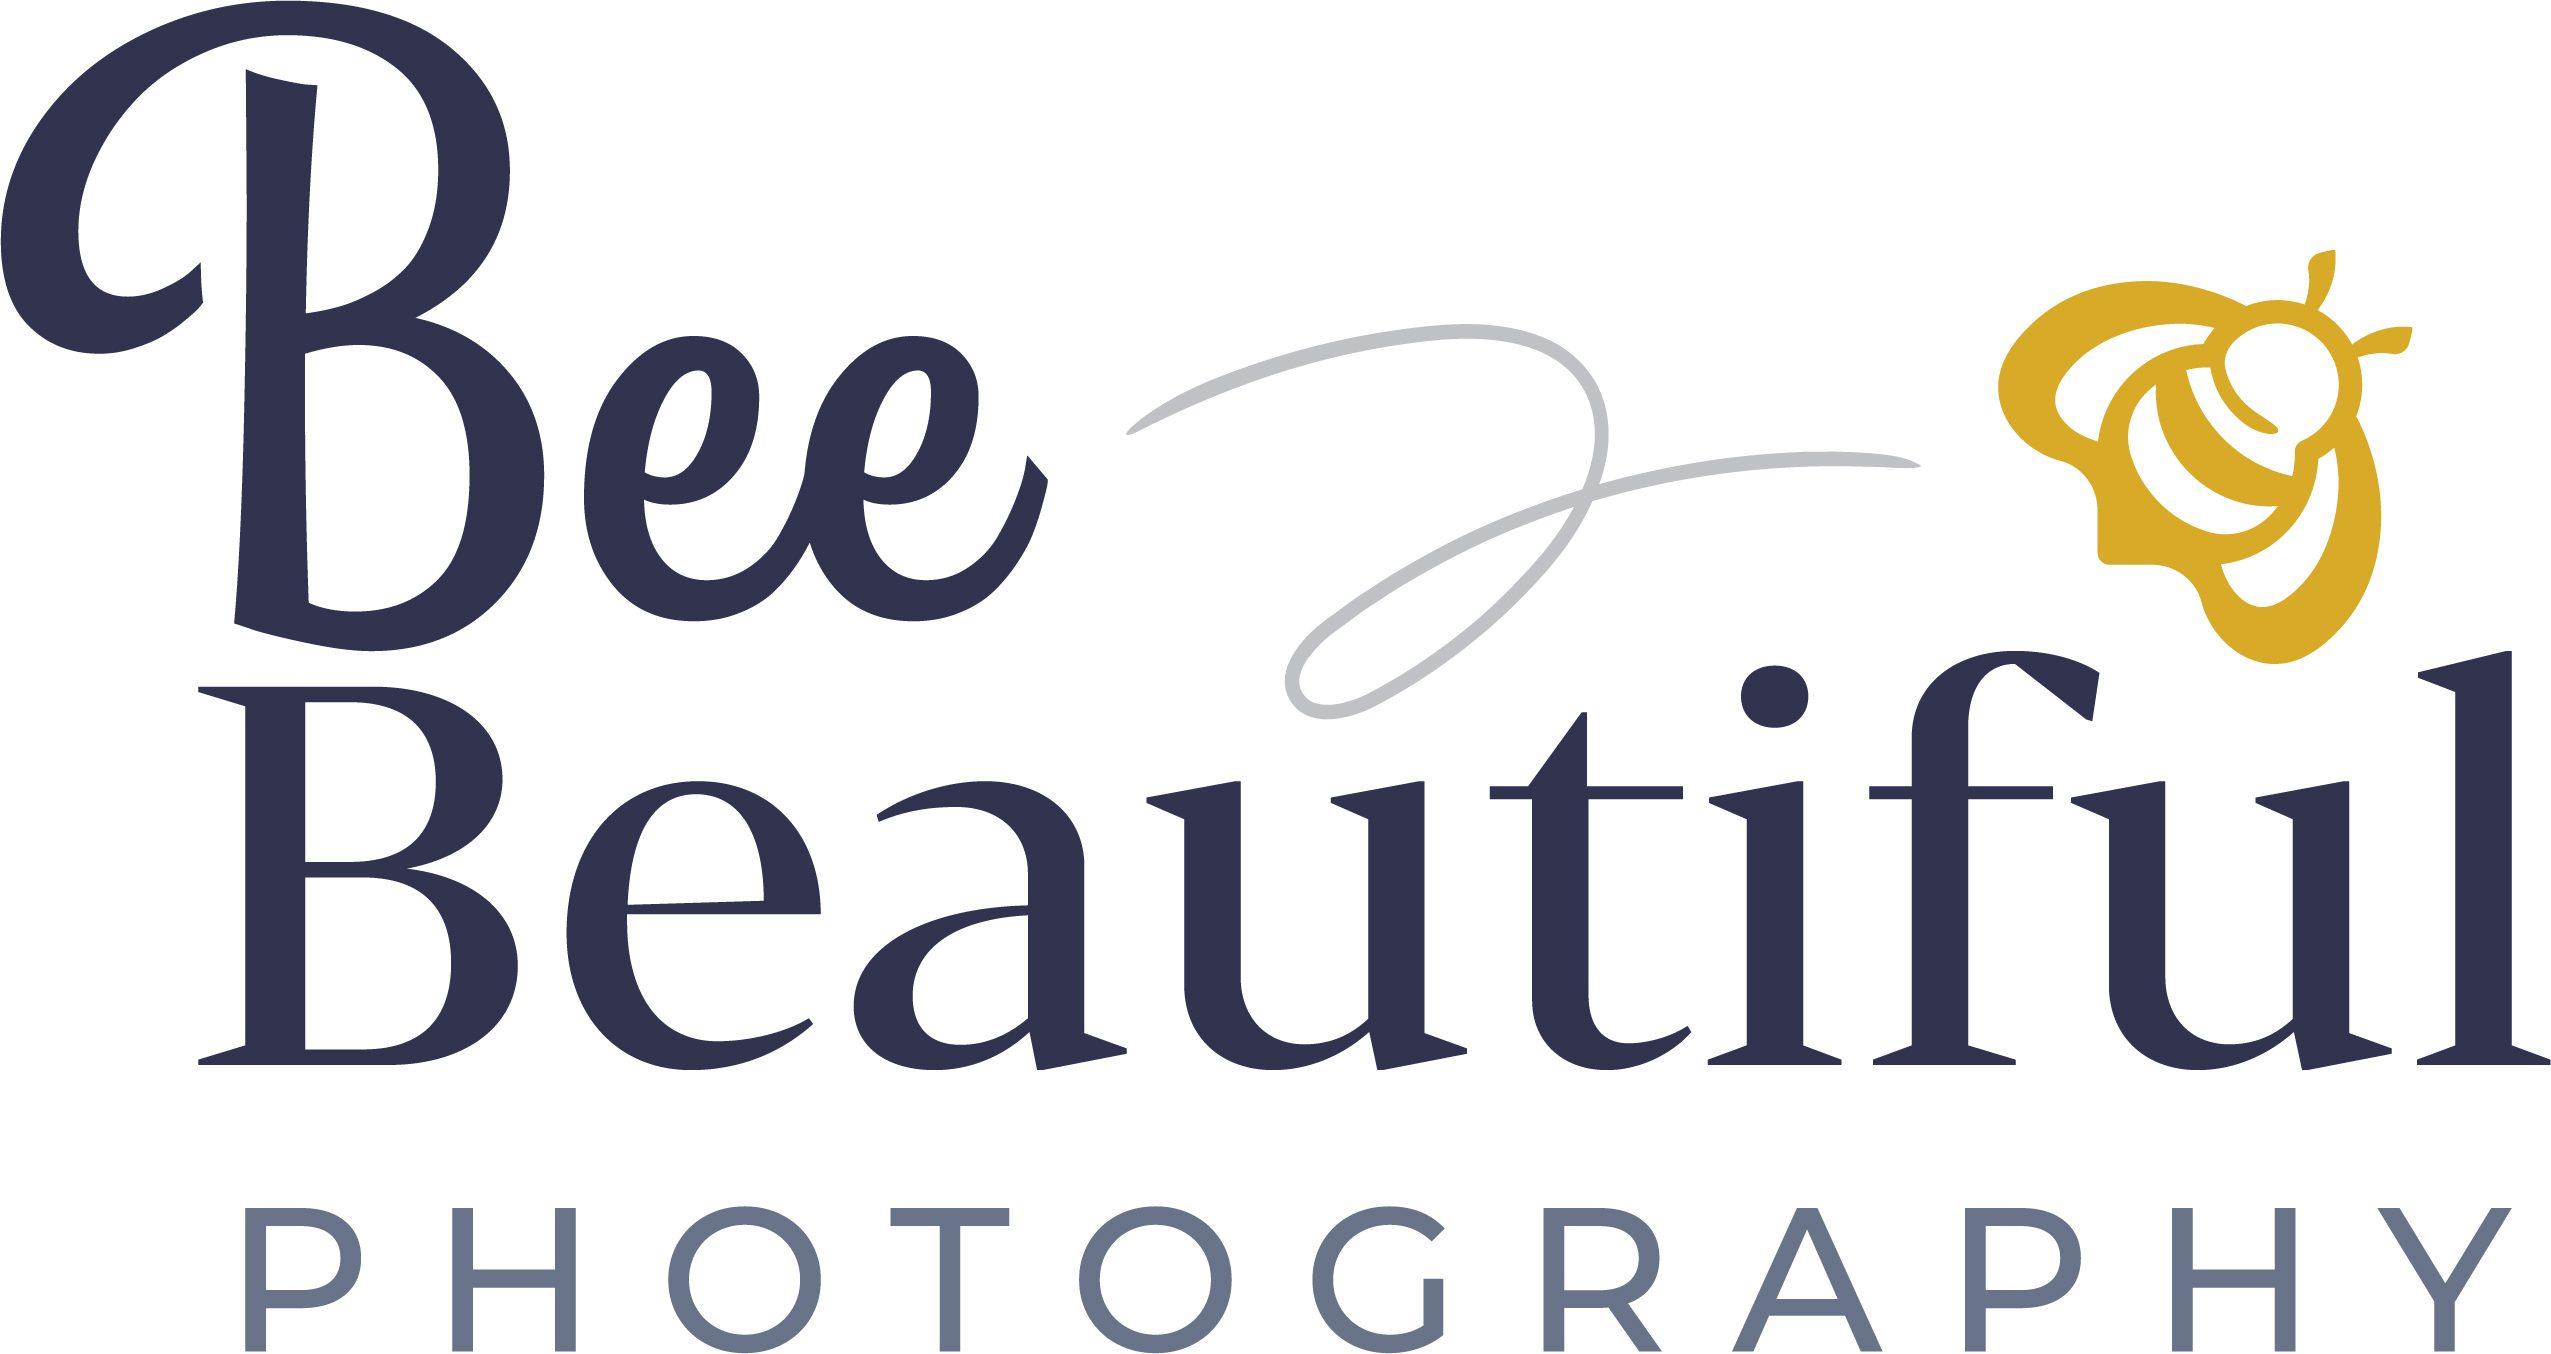 Bee Beautiful Photography